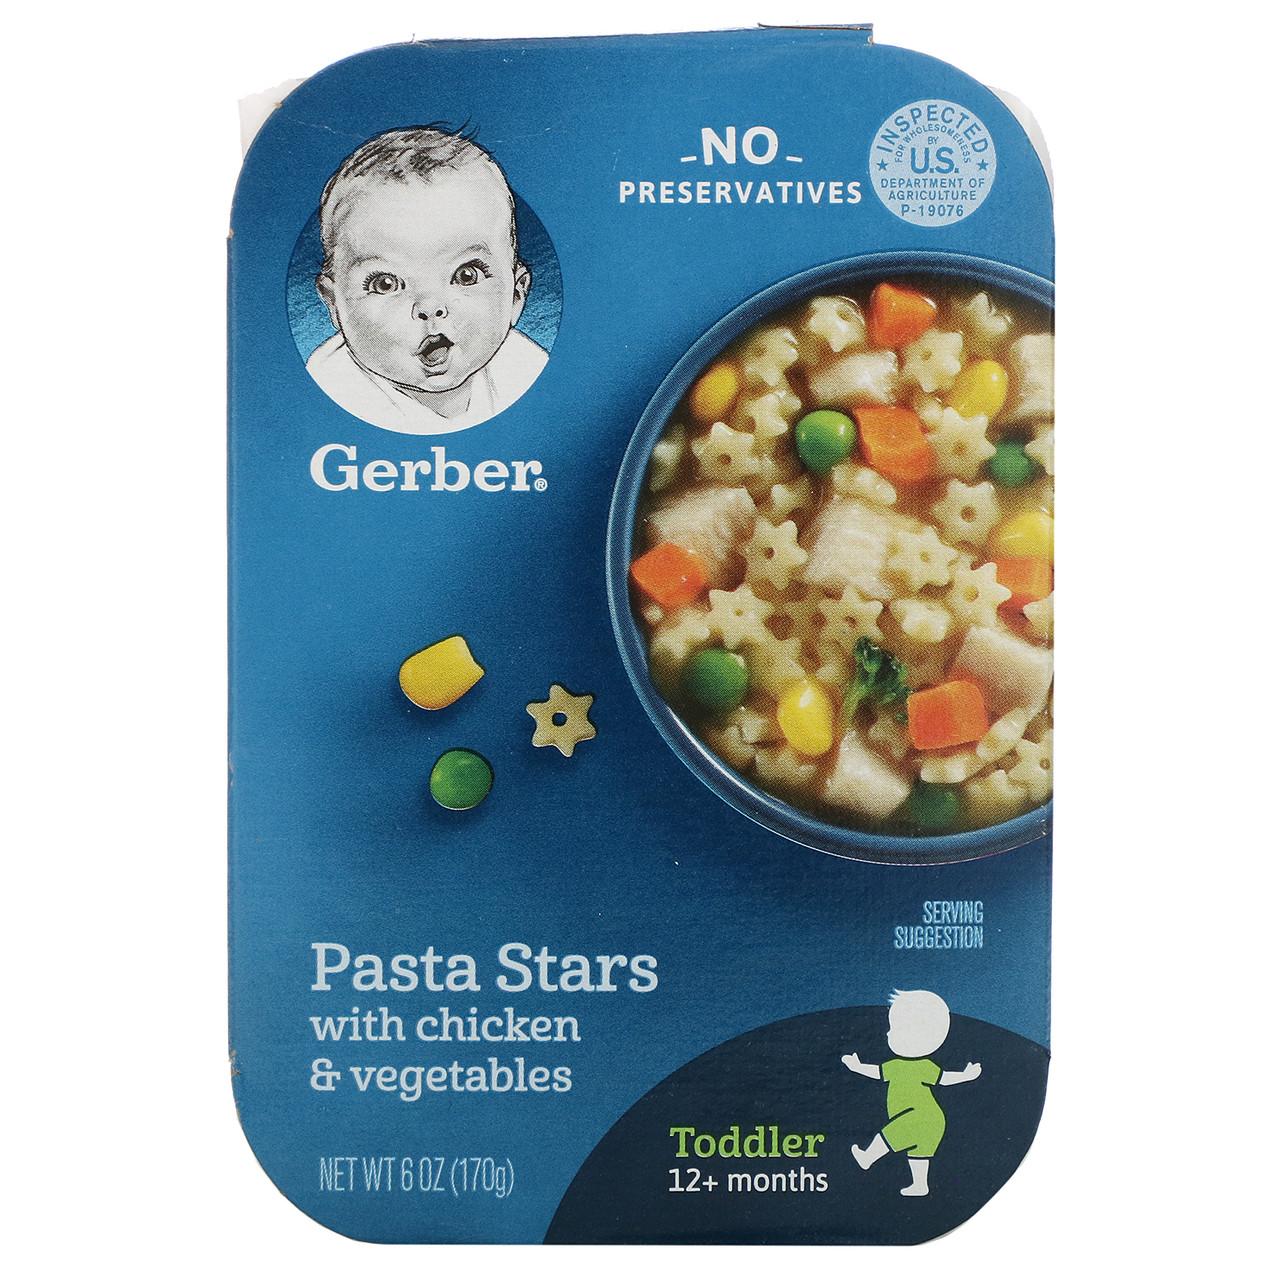 Дитяче харчування, паста з куркою і овочами, (Graduates for Toddlers, Lil' Meals), Gerber, 170г